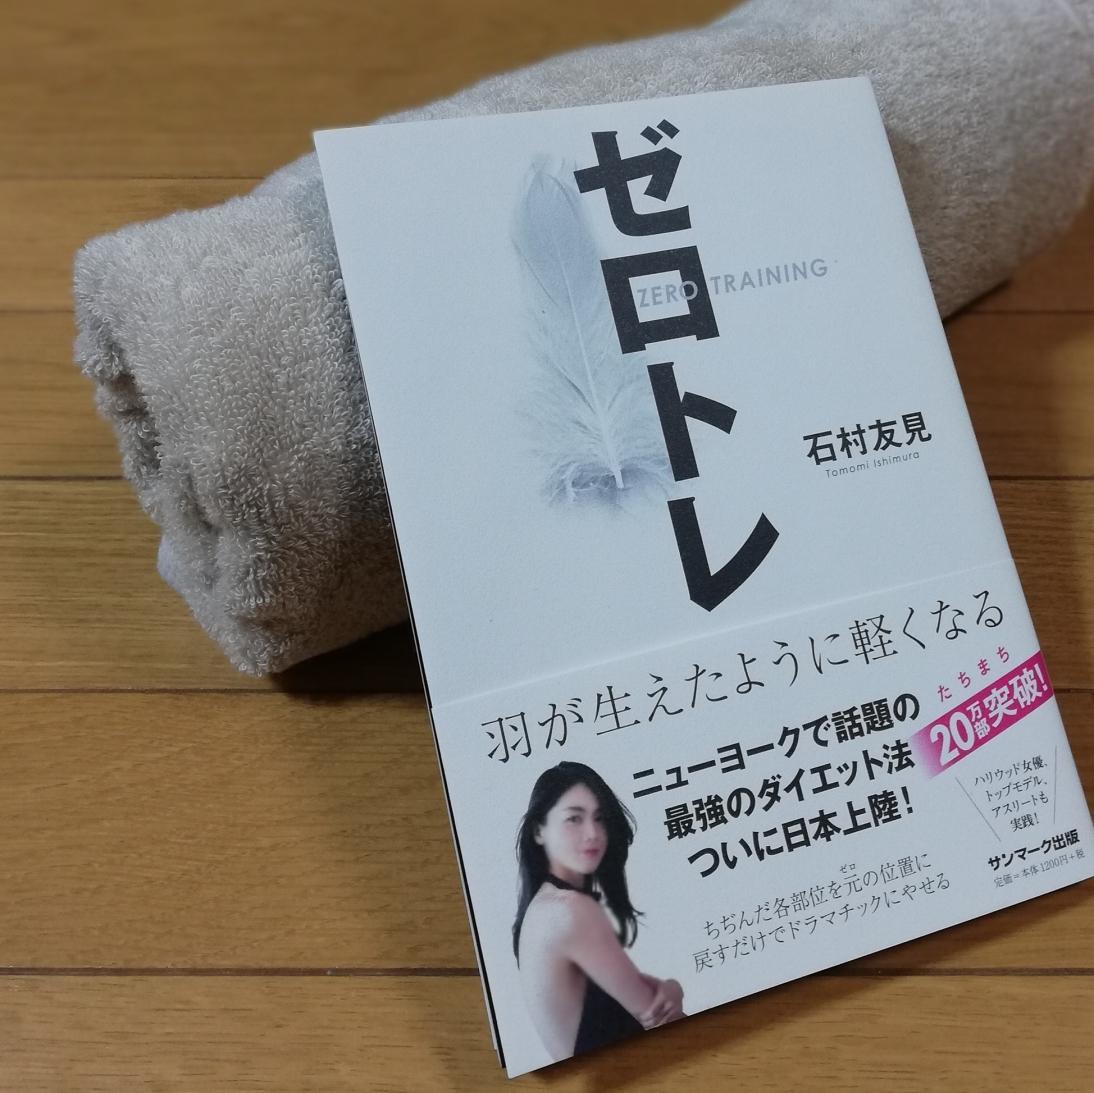 f:id:nao-chun:20190817163431j:plain